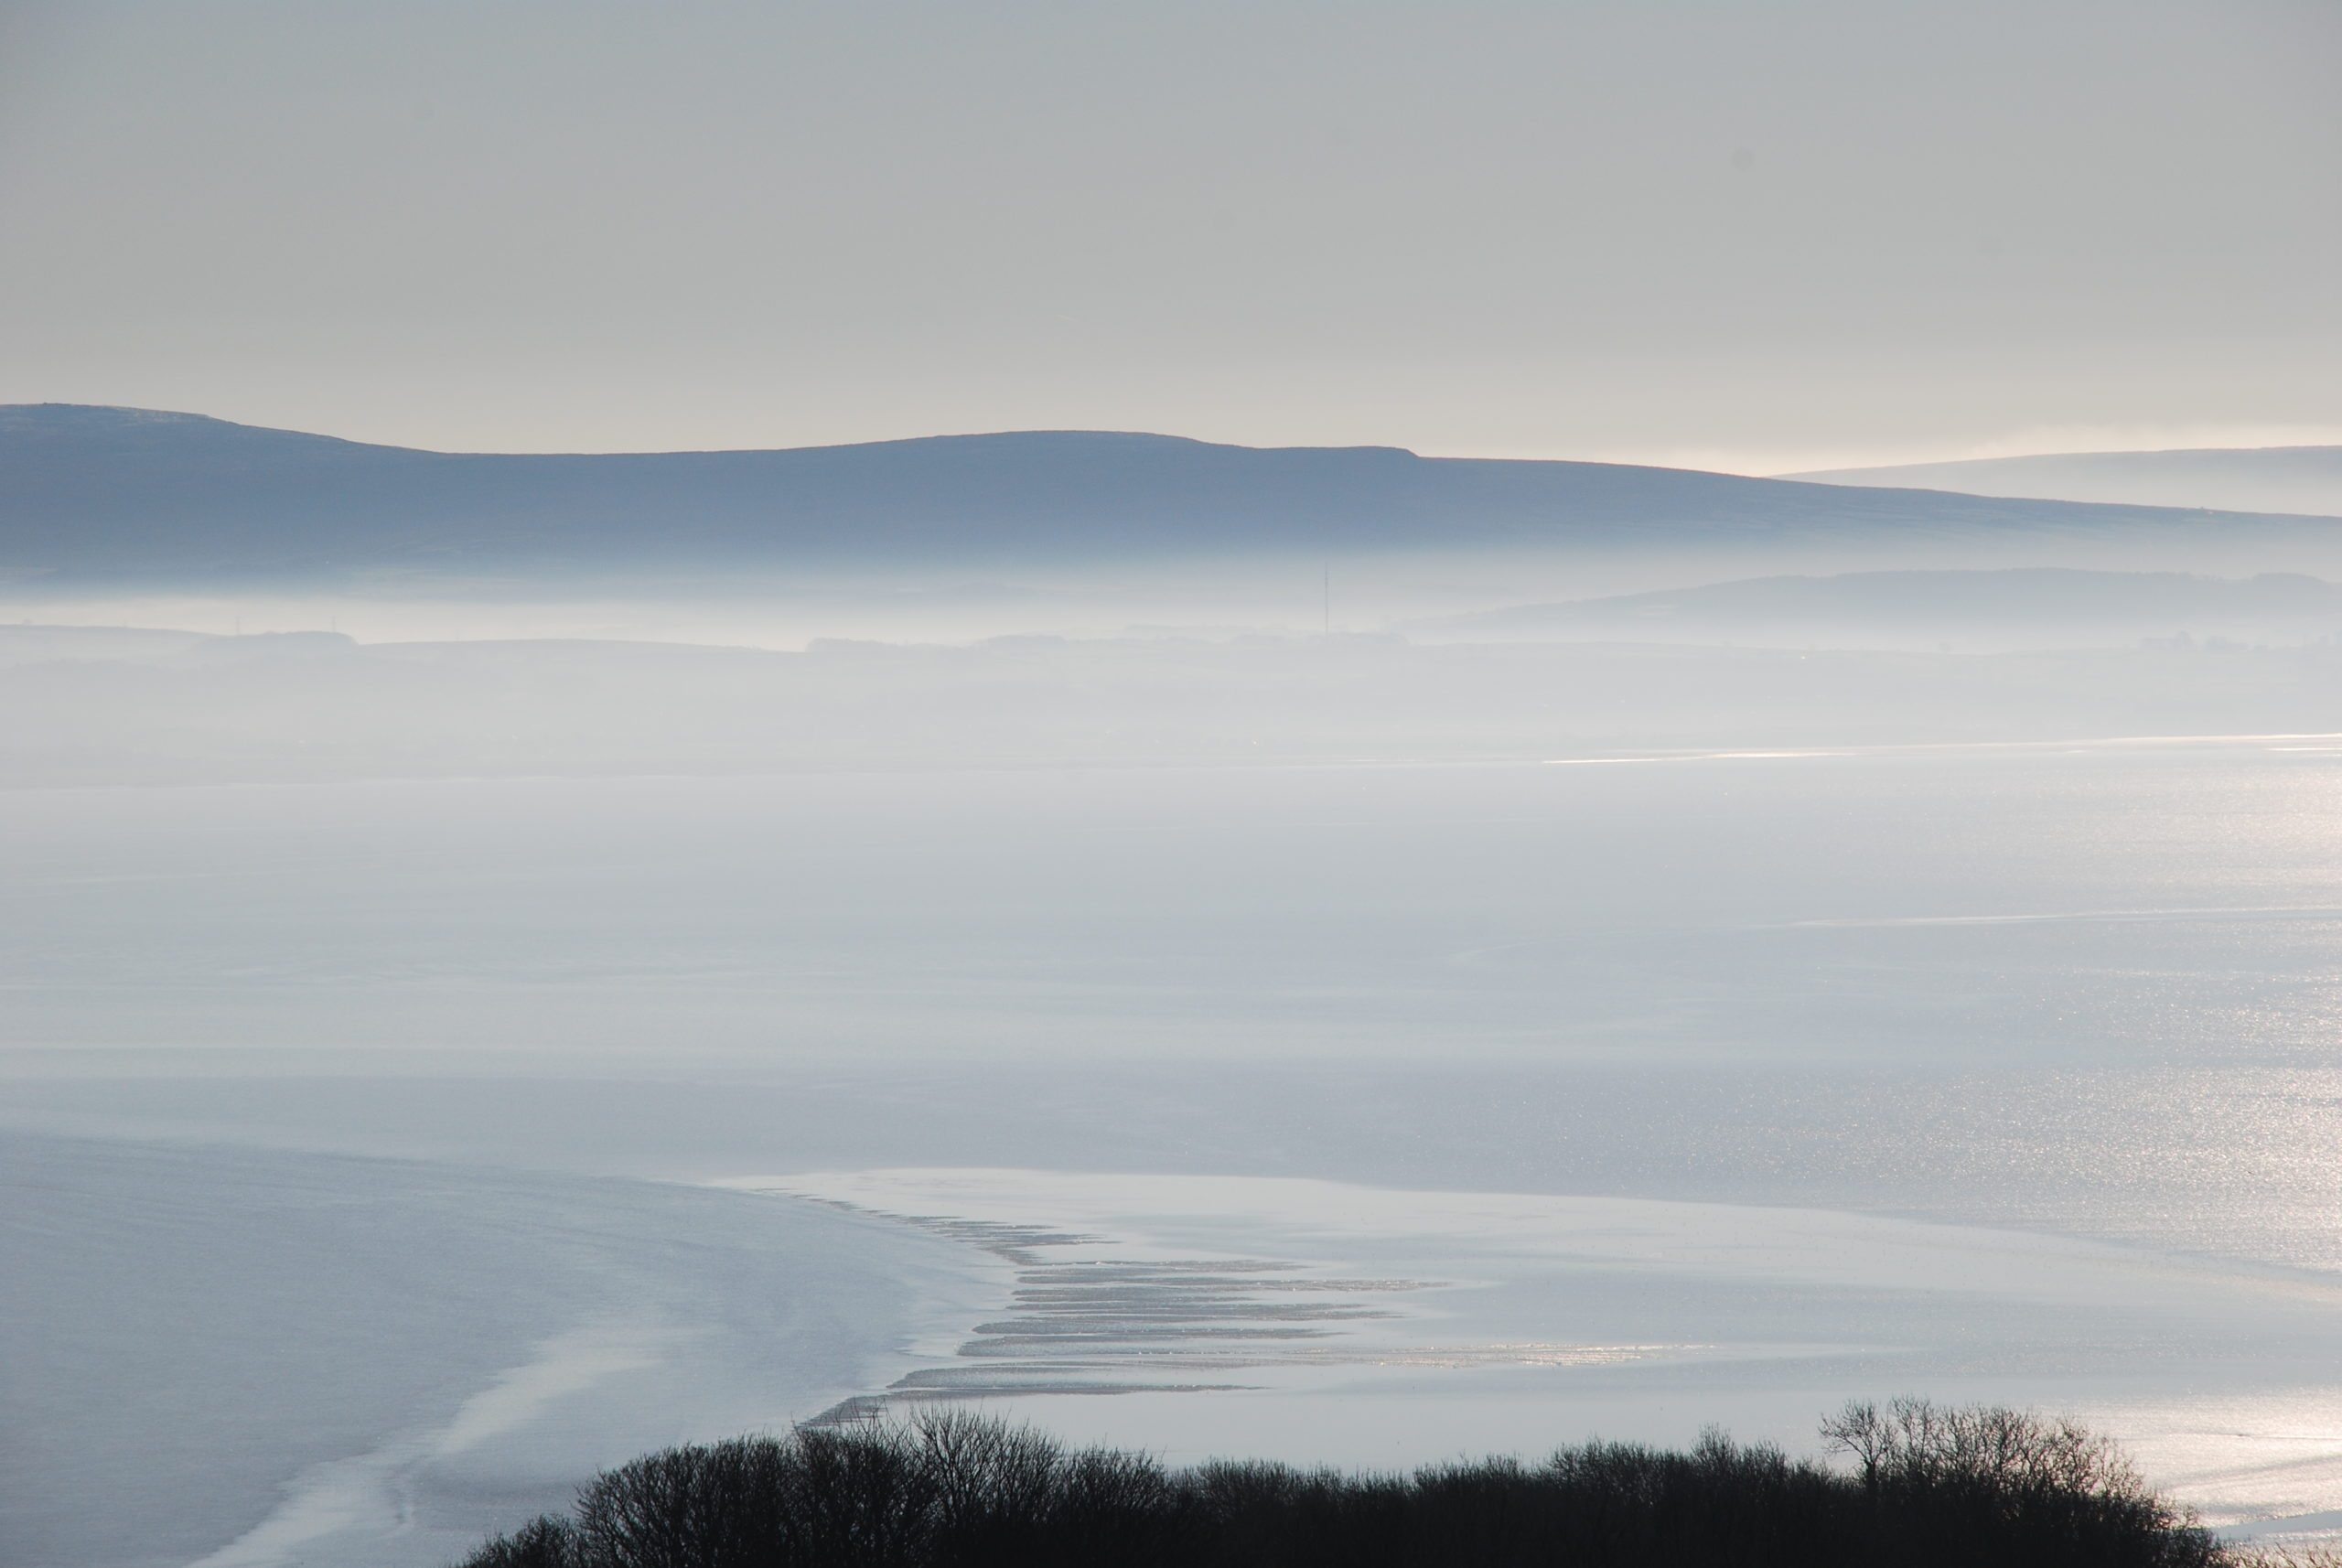 Misty morning over Morecambe Bay